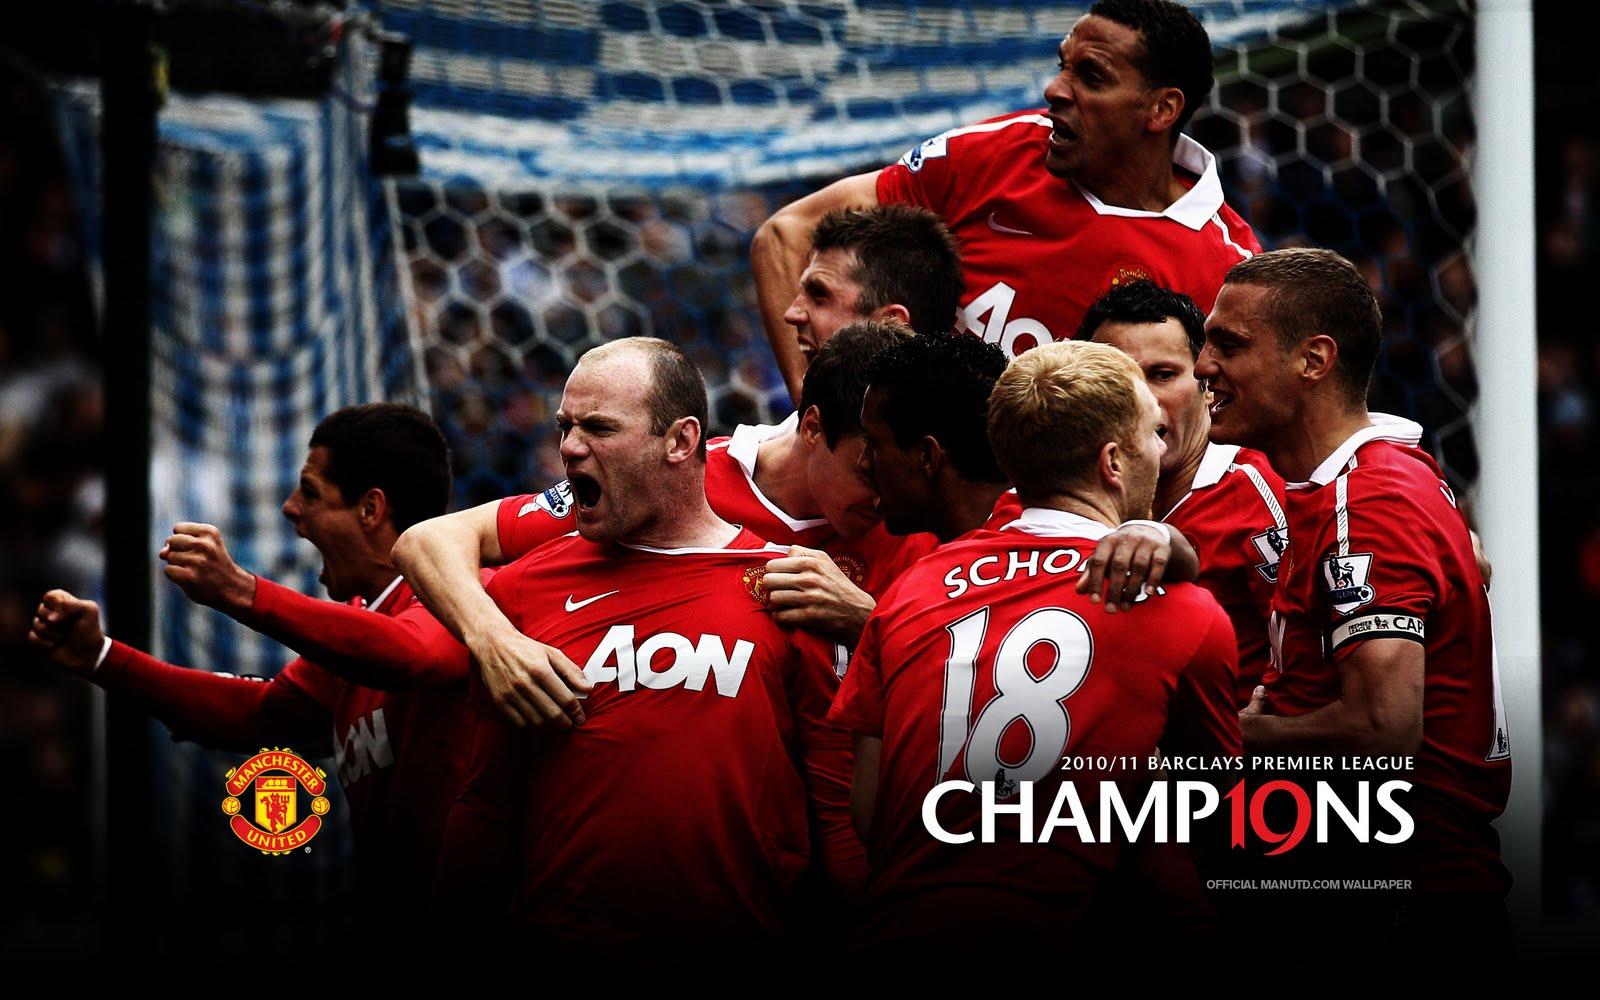 Man Utd Champions 2011 Celebration Wallpaper Man United Malaysia No 1600x1000